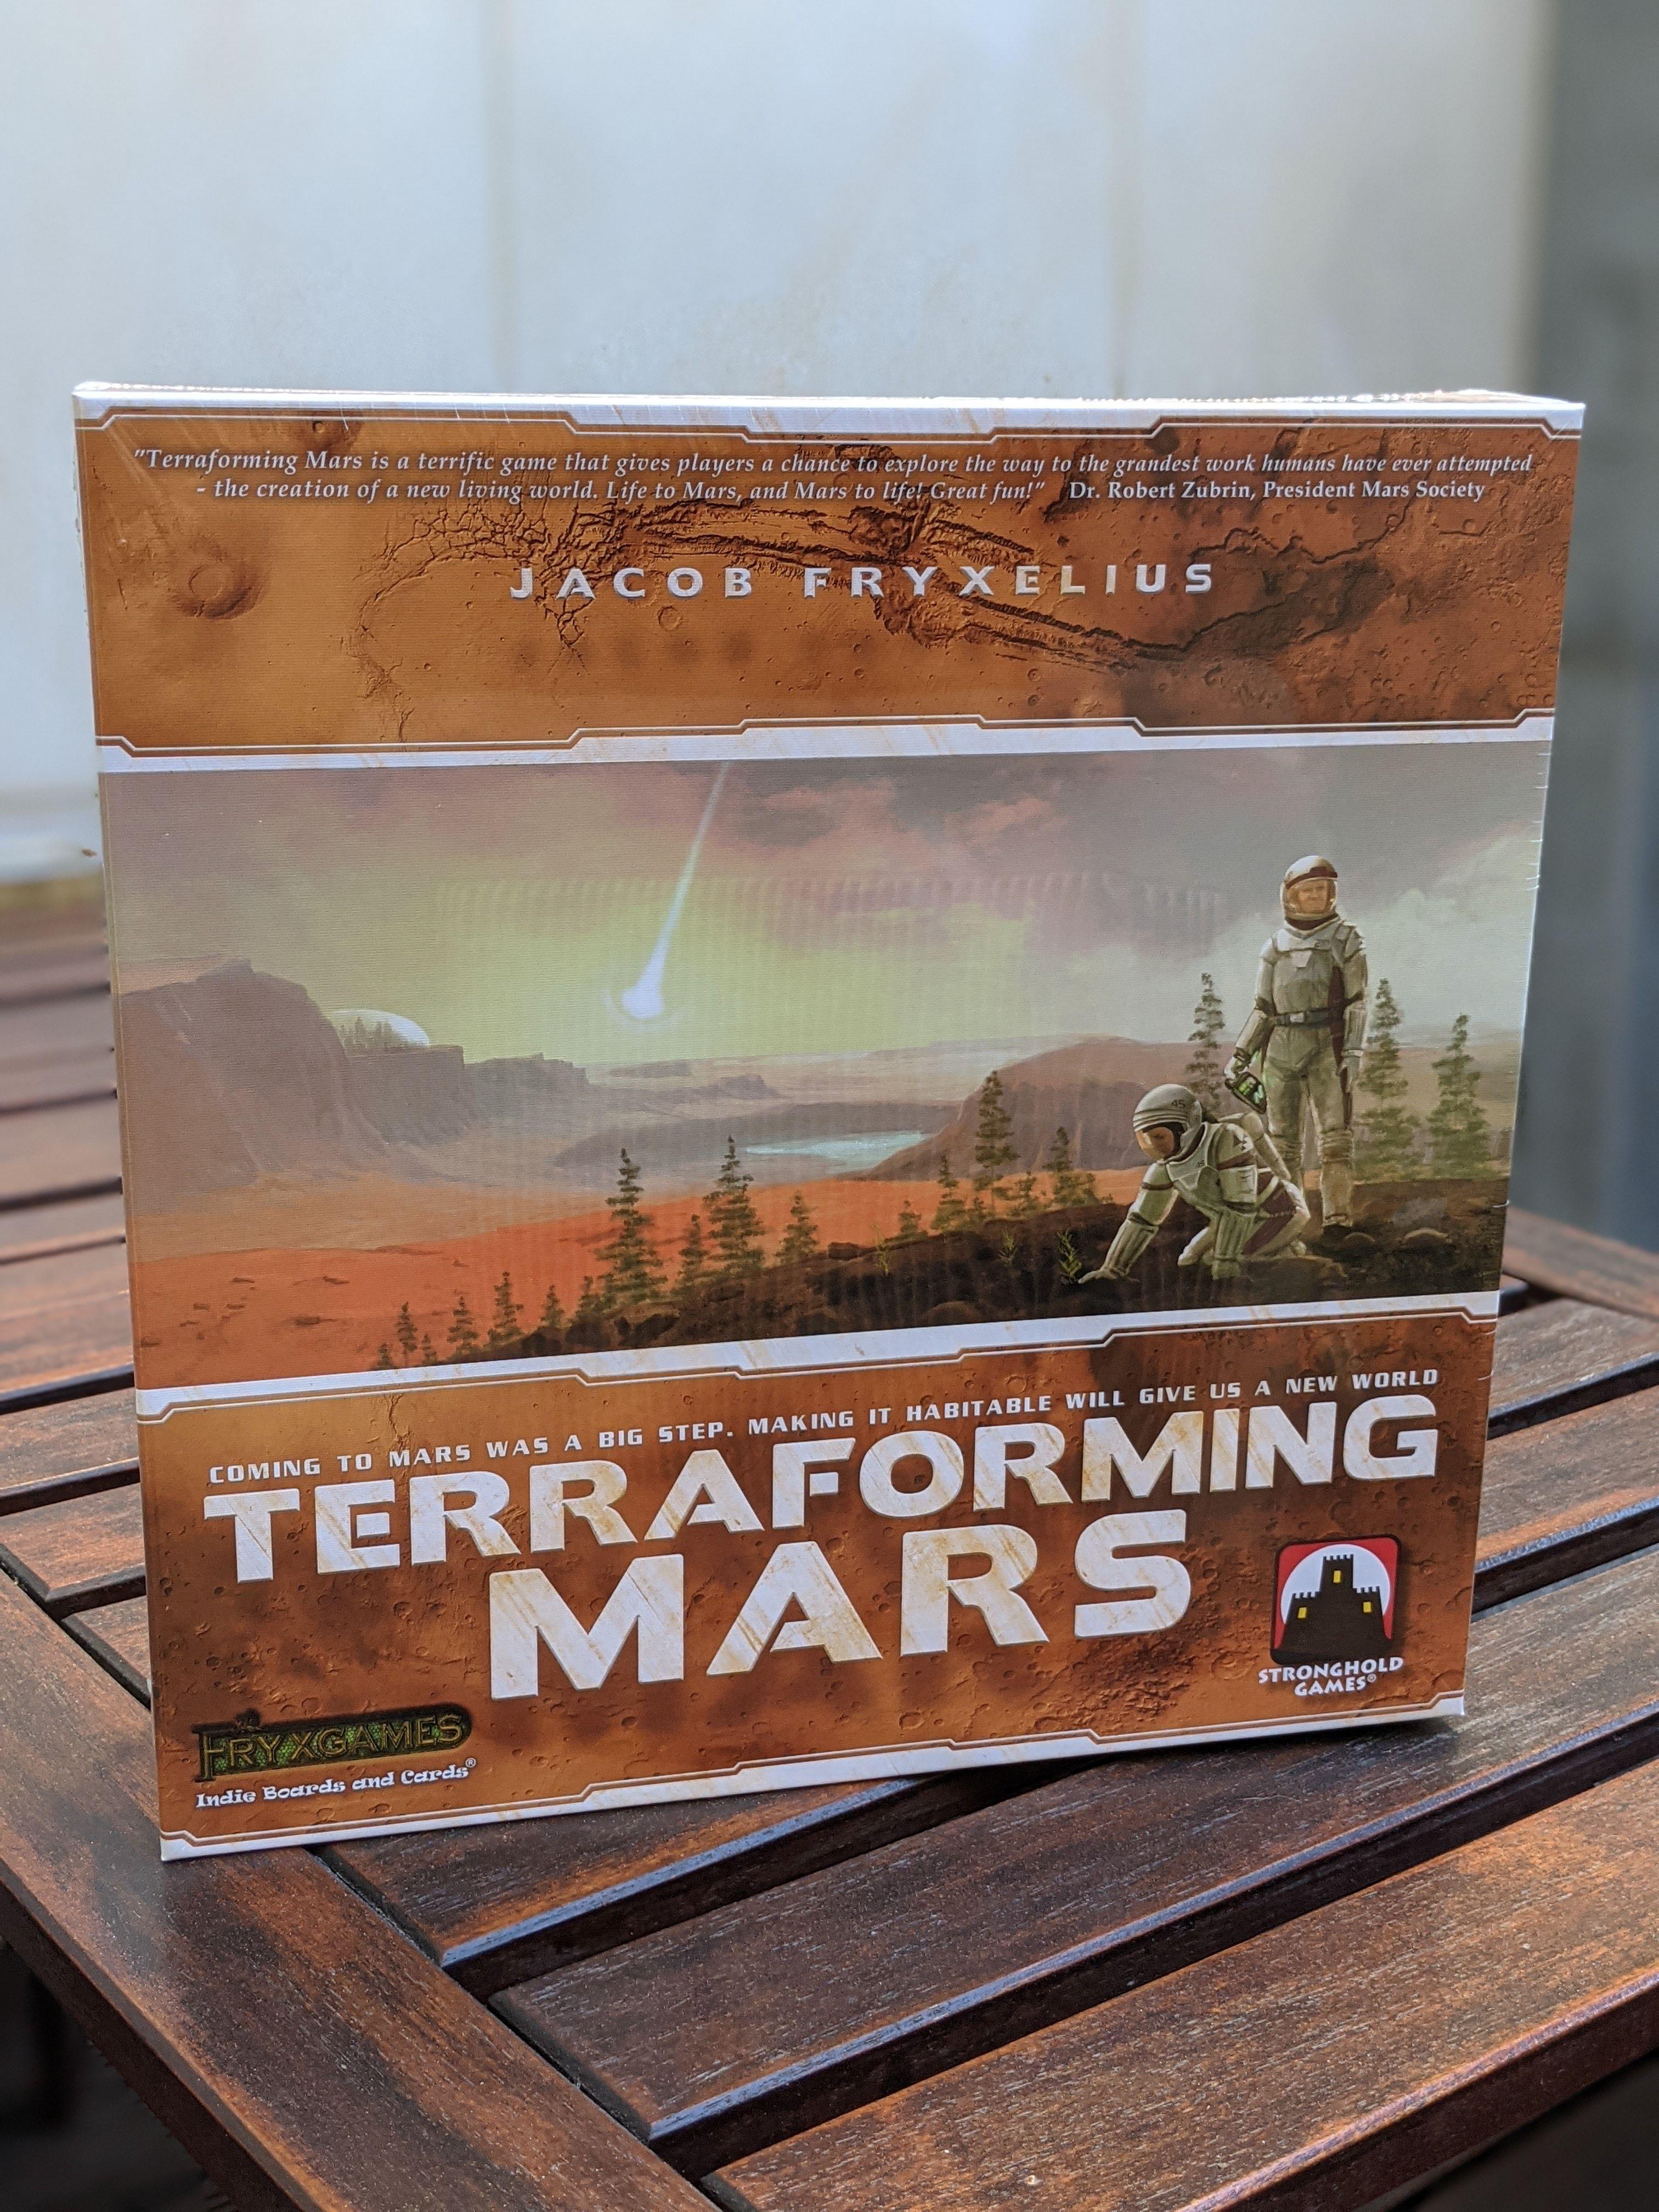 Let's play Terraforming Mars